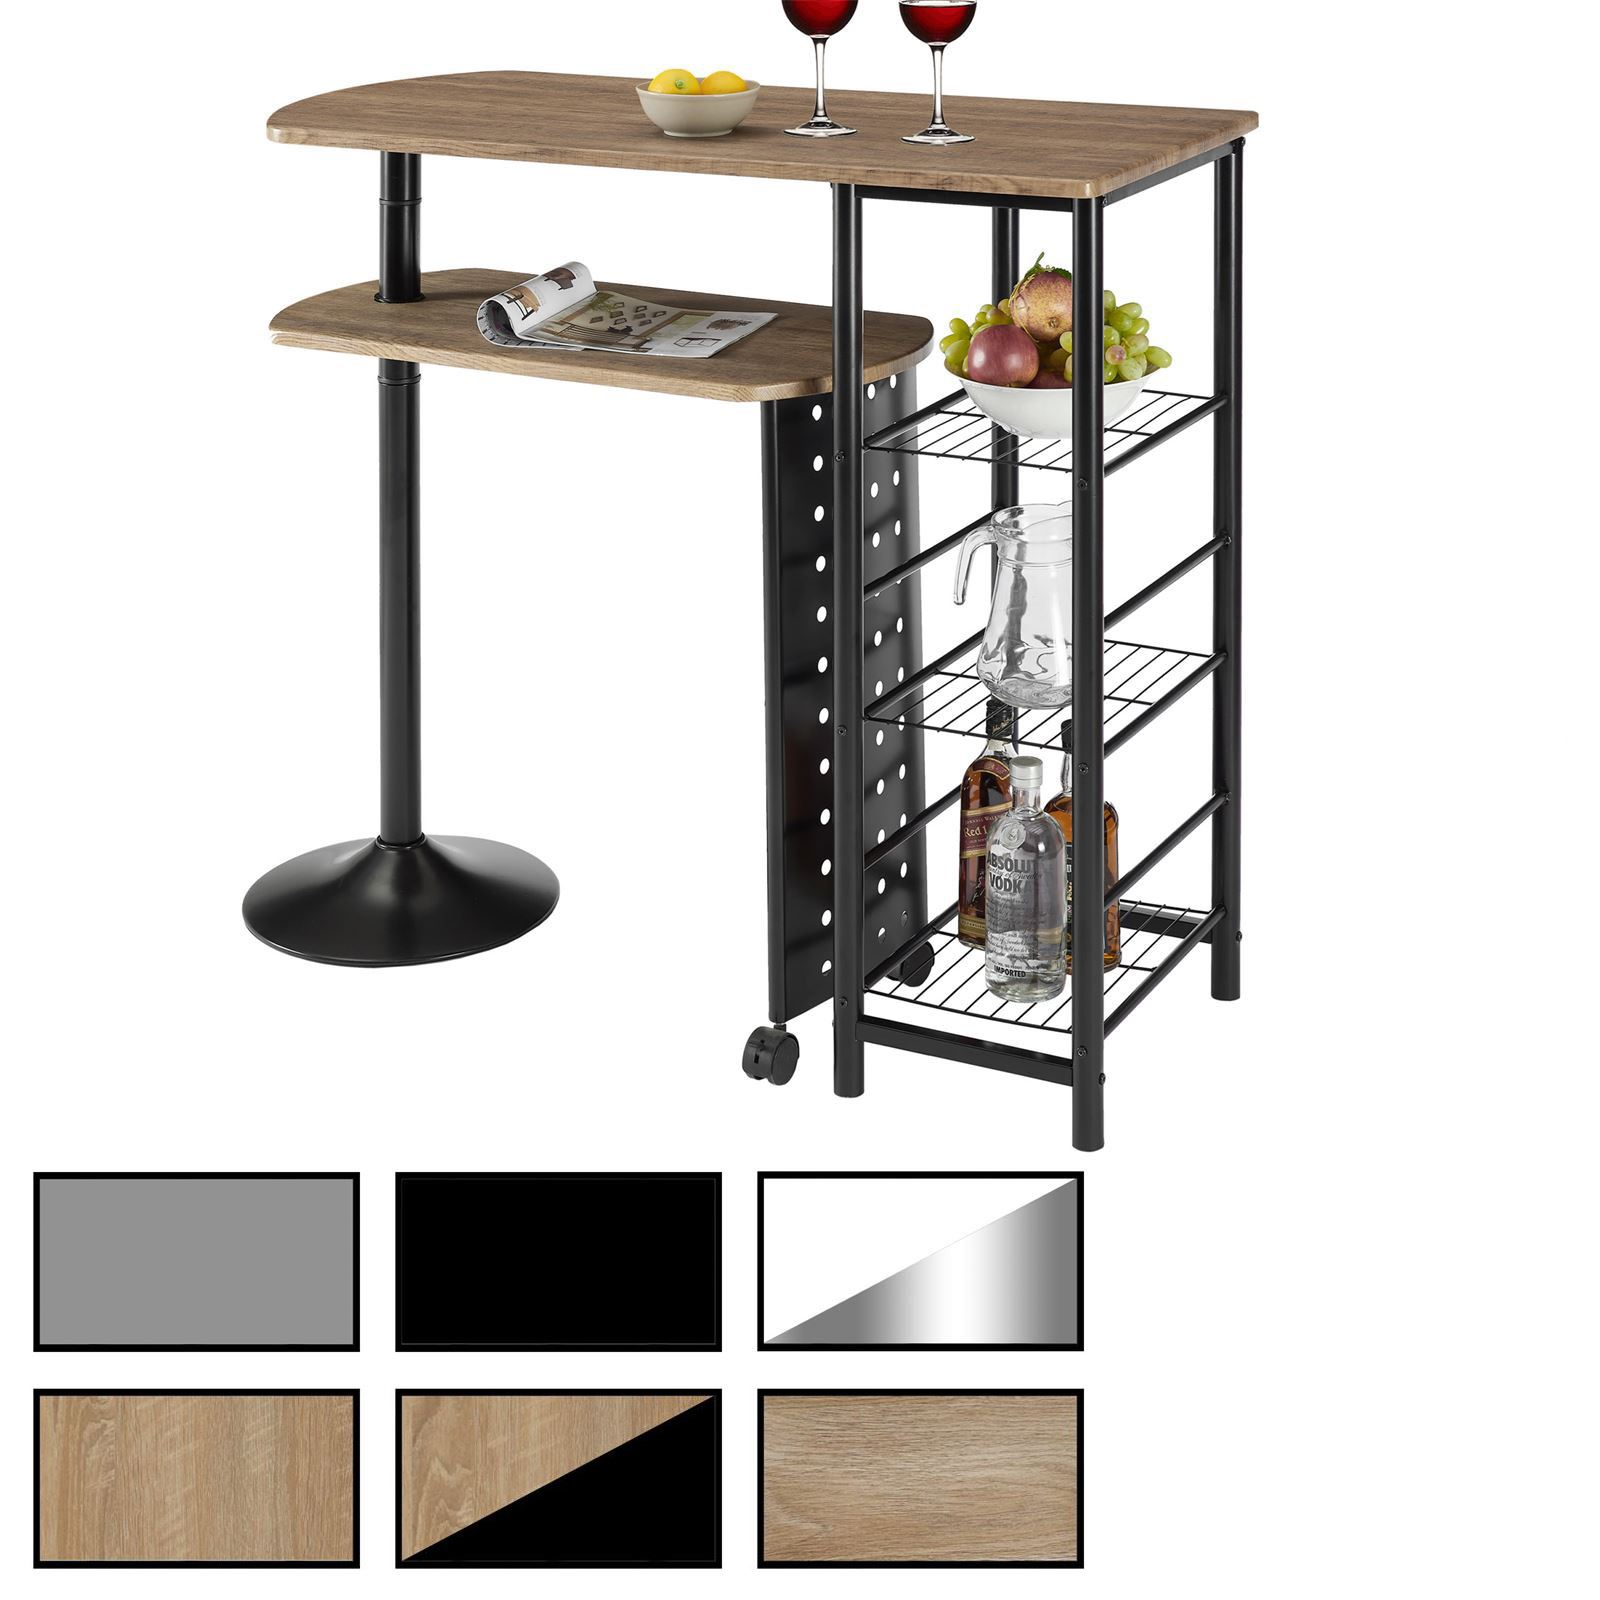 bartisch josua mit regal mobilia24. Black Bedroom Furniture Sets. Home Design Ideas